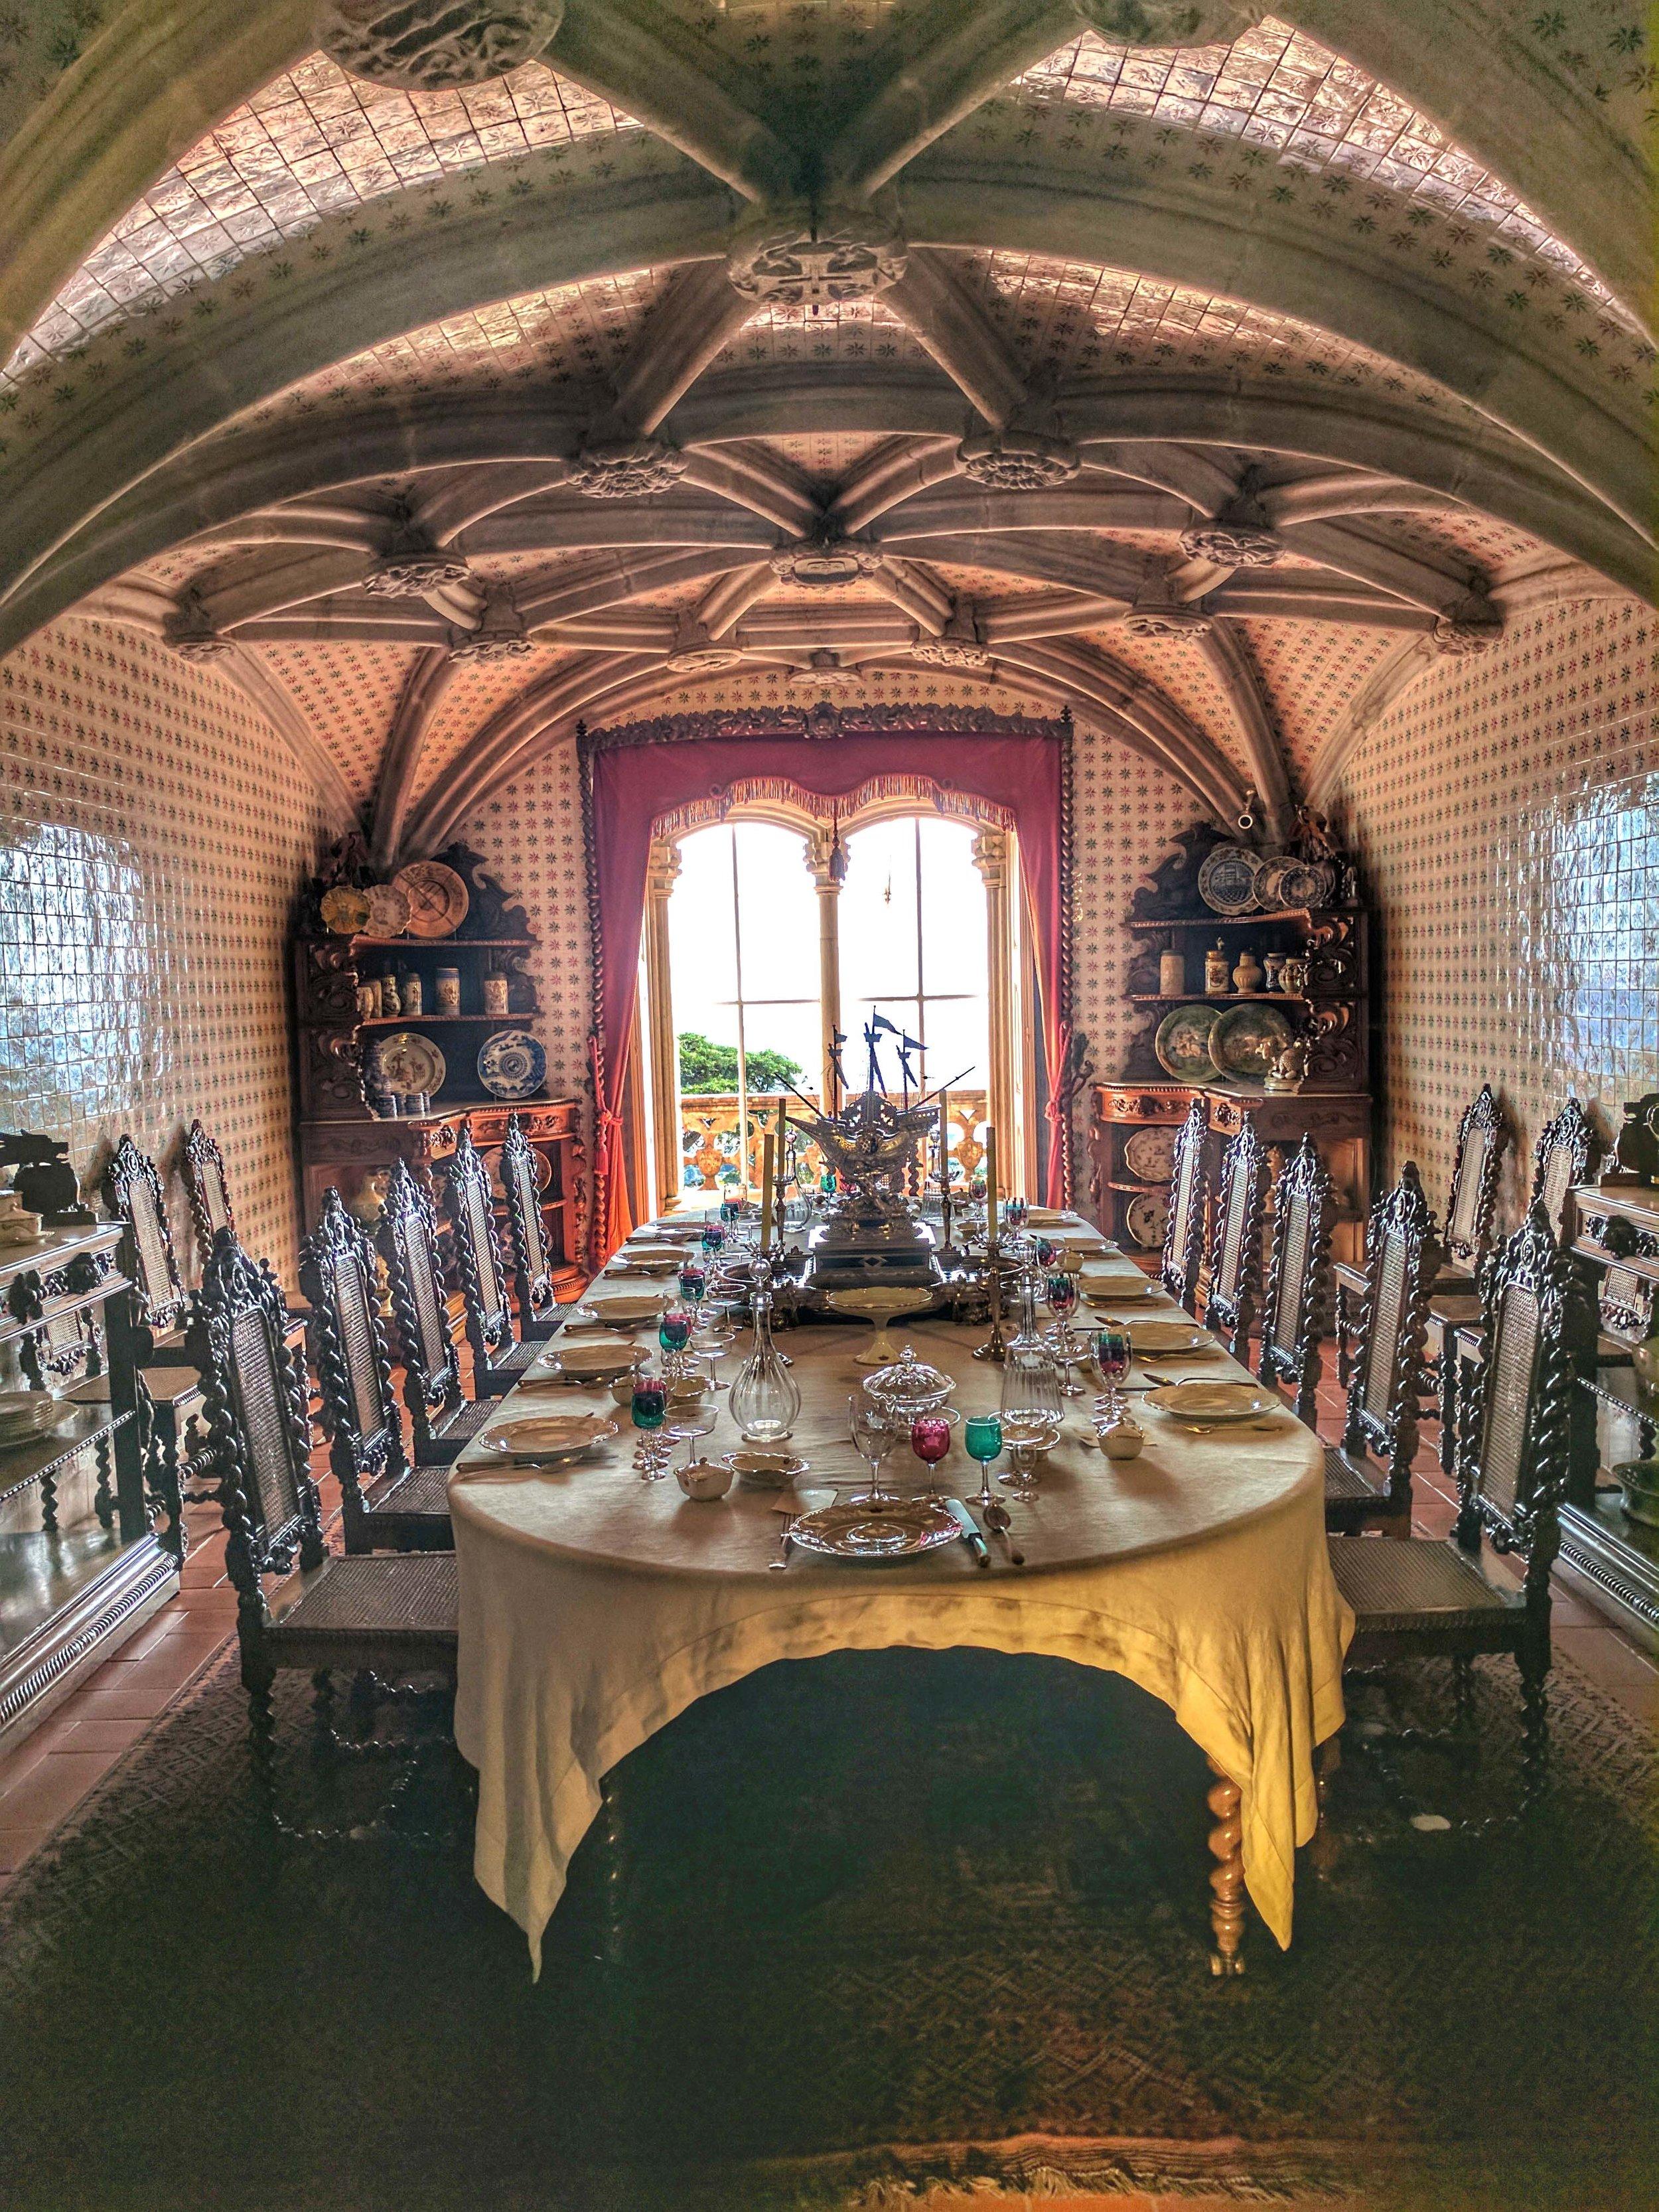 Sumptuous Interior of Pena Palace